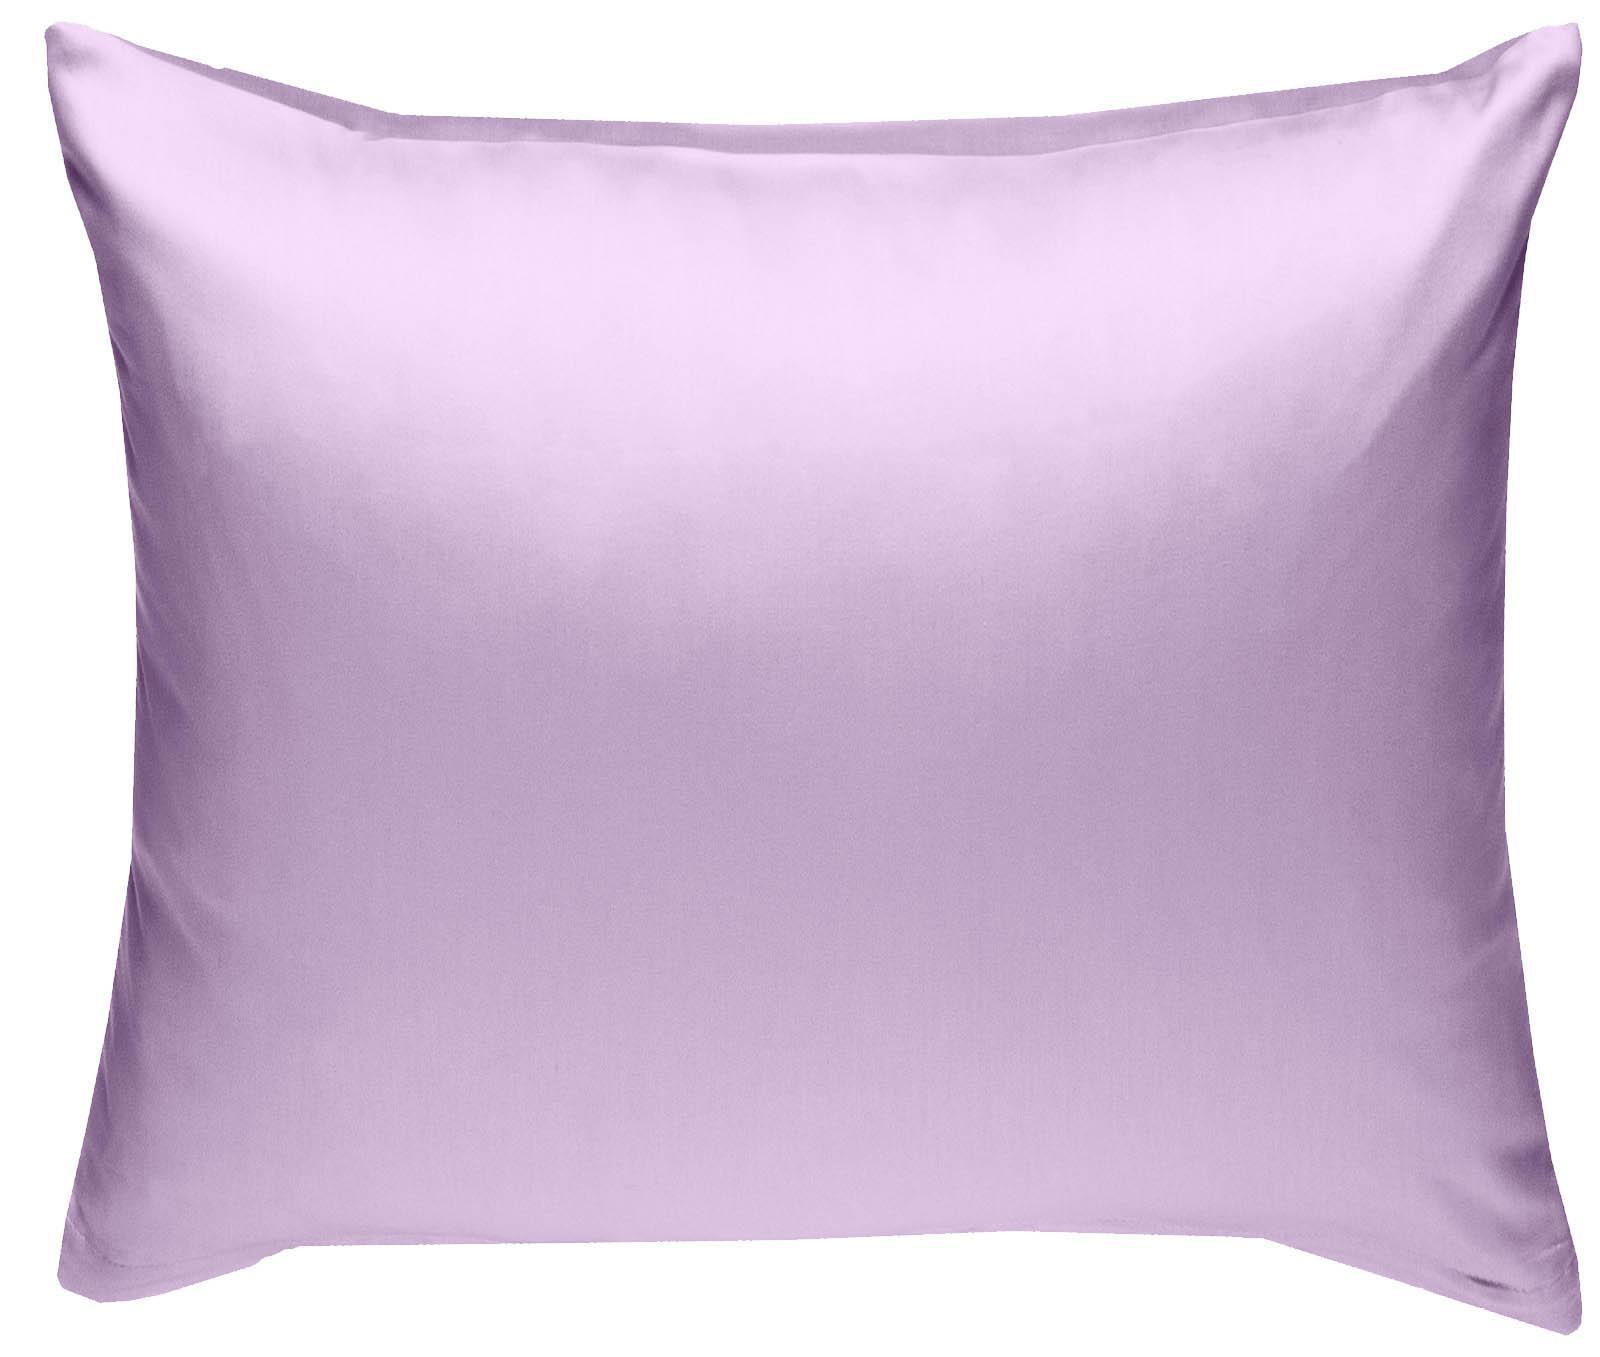 Mako Satin Kissenbezug uni flieder rosa 80x80 cm